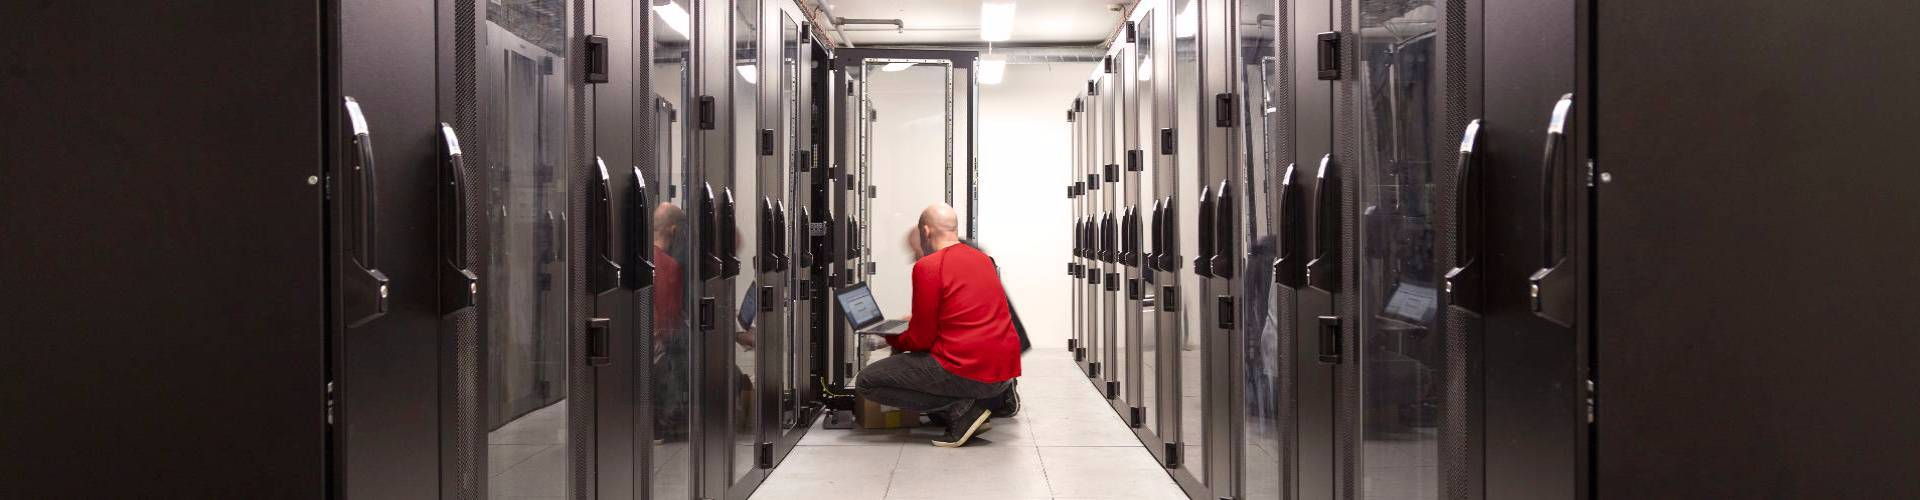 Security Best Practices for Azure App Service Web Apps, Part 5